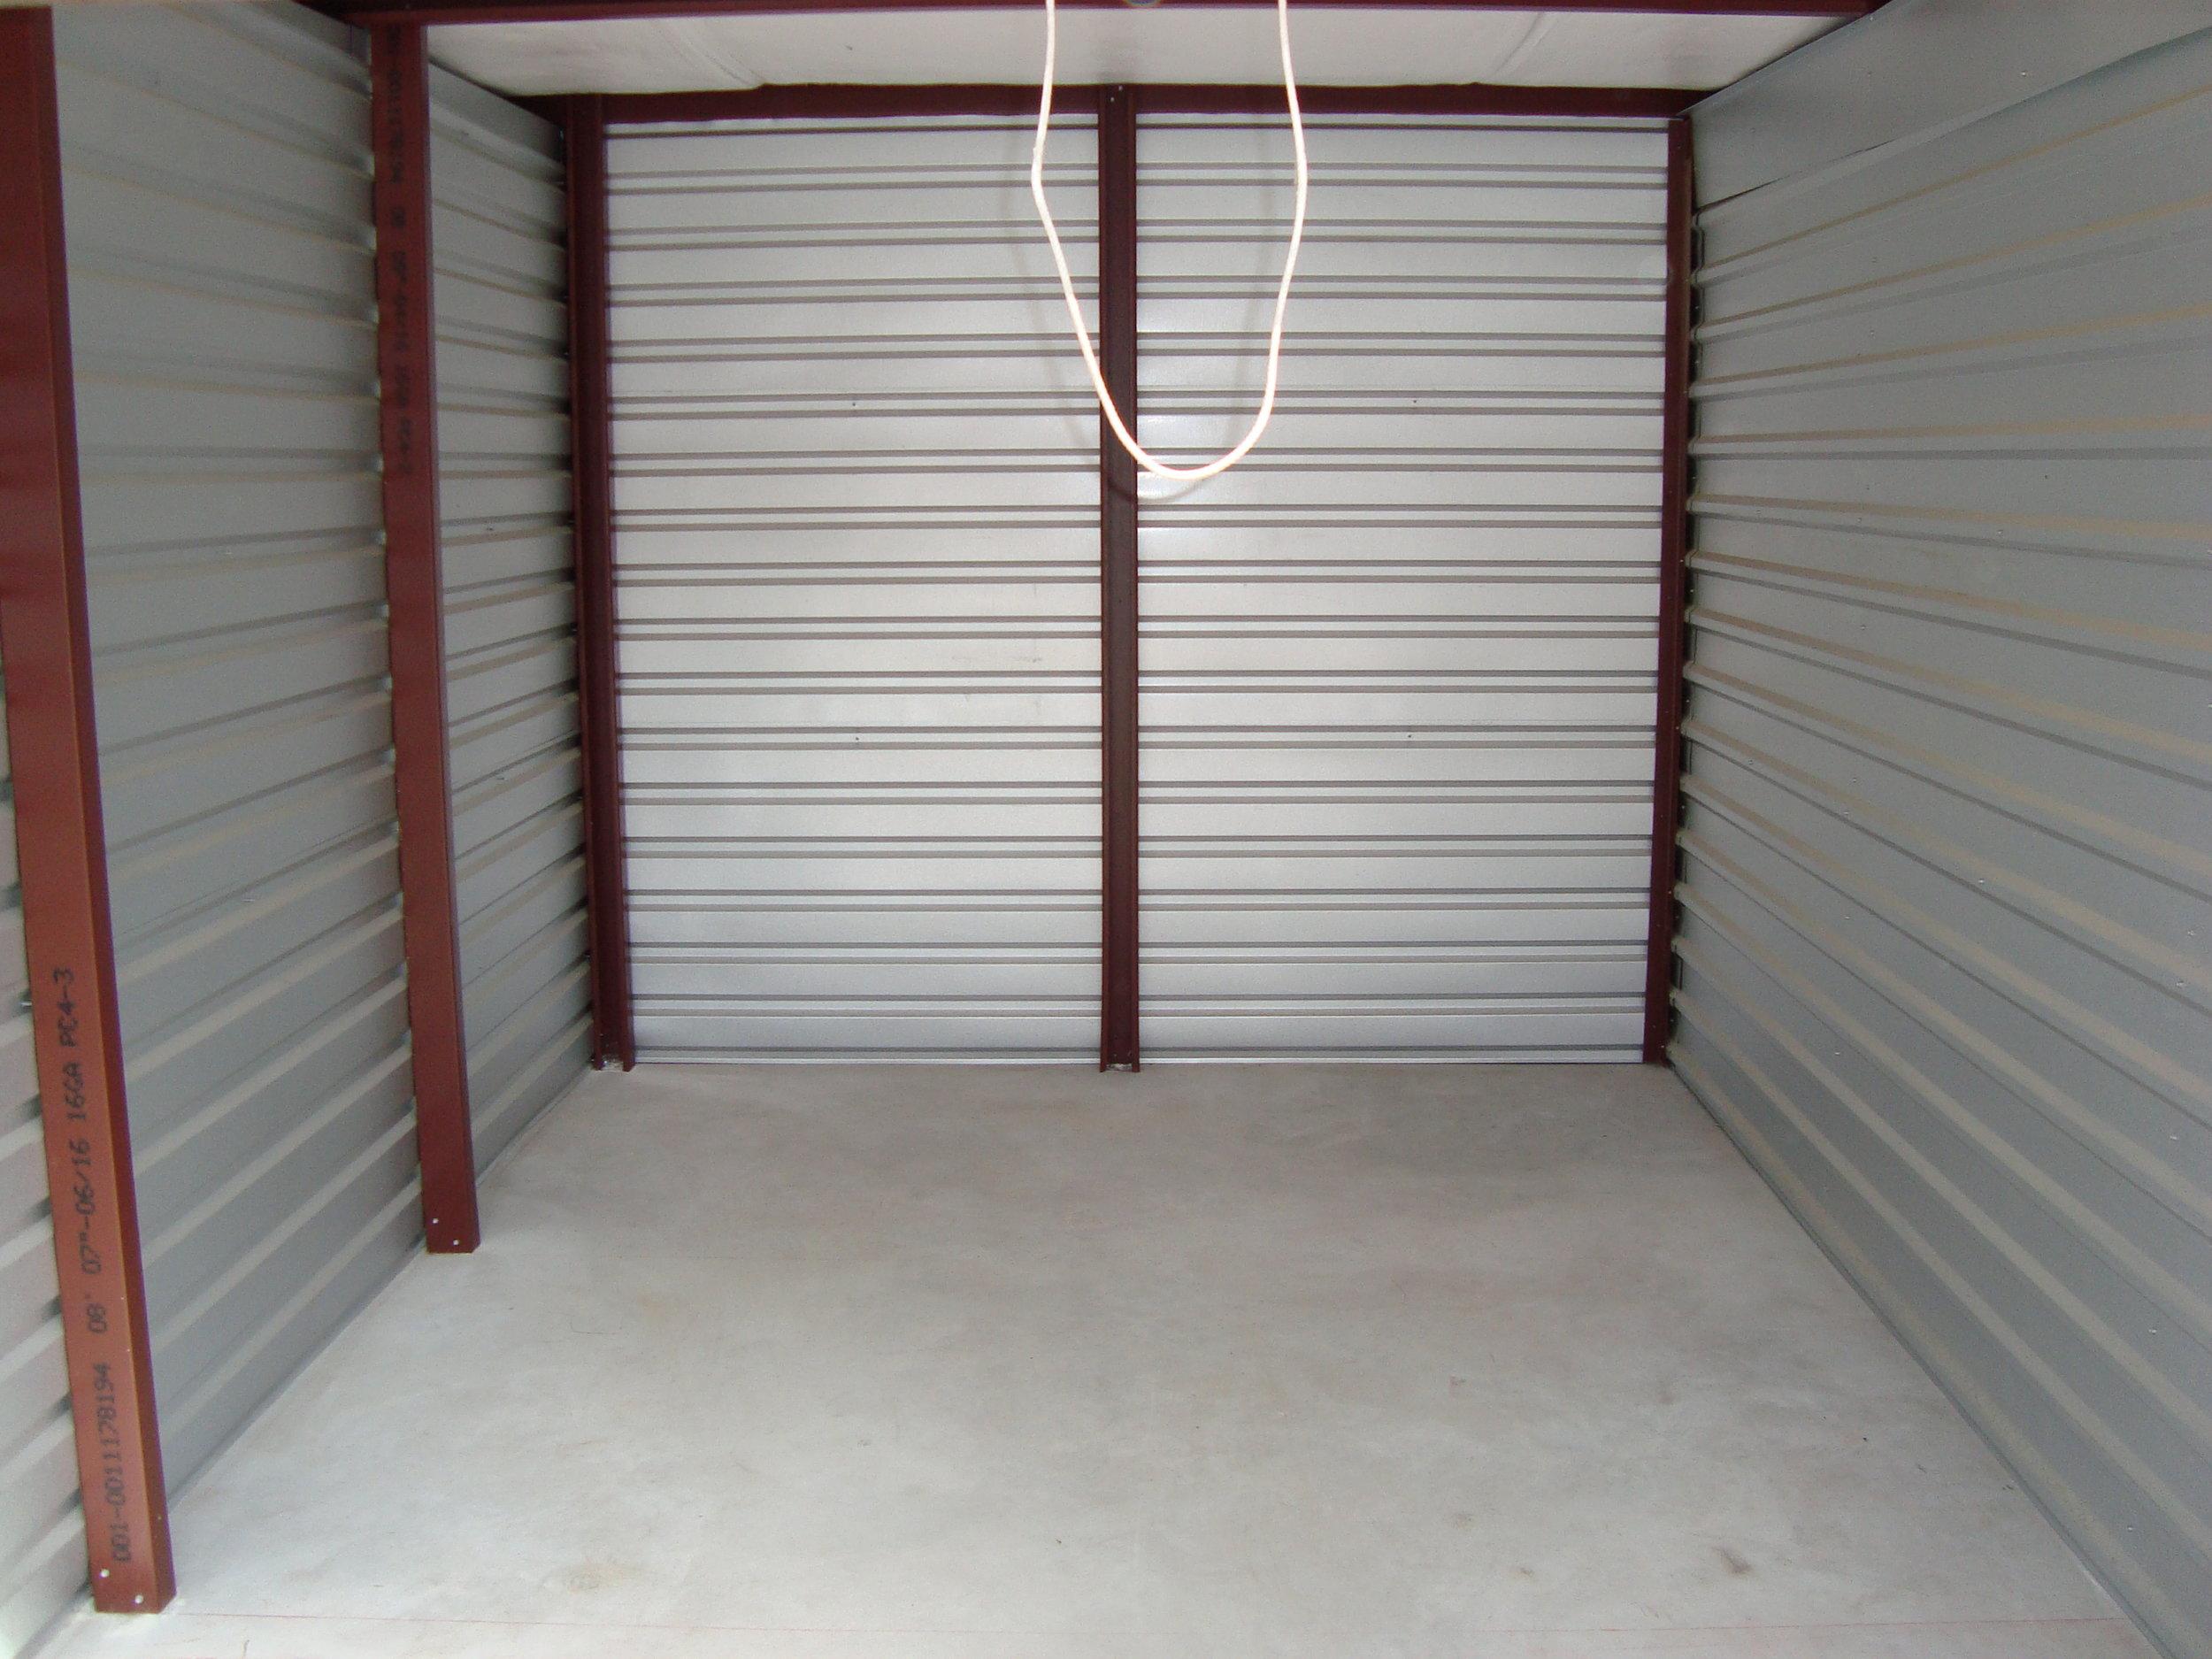 Cypress Creek Storage - Self Storage - Cypress, TX 77429